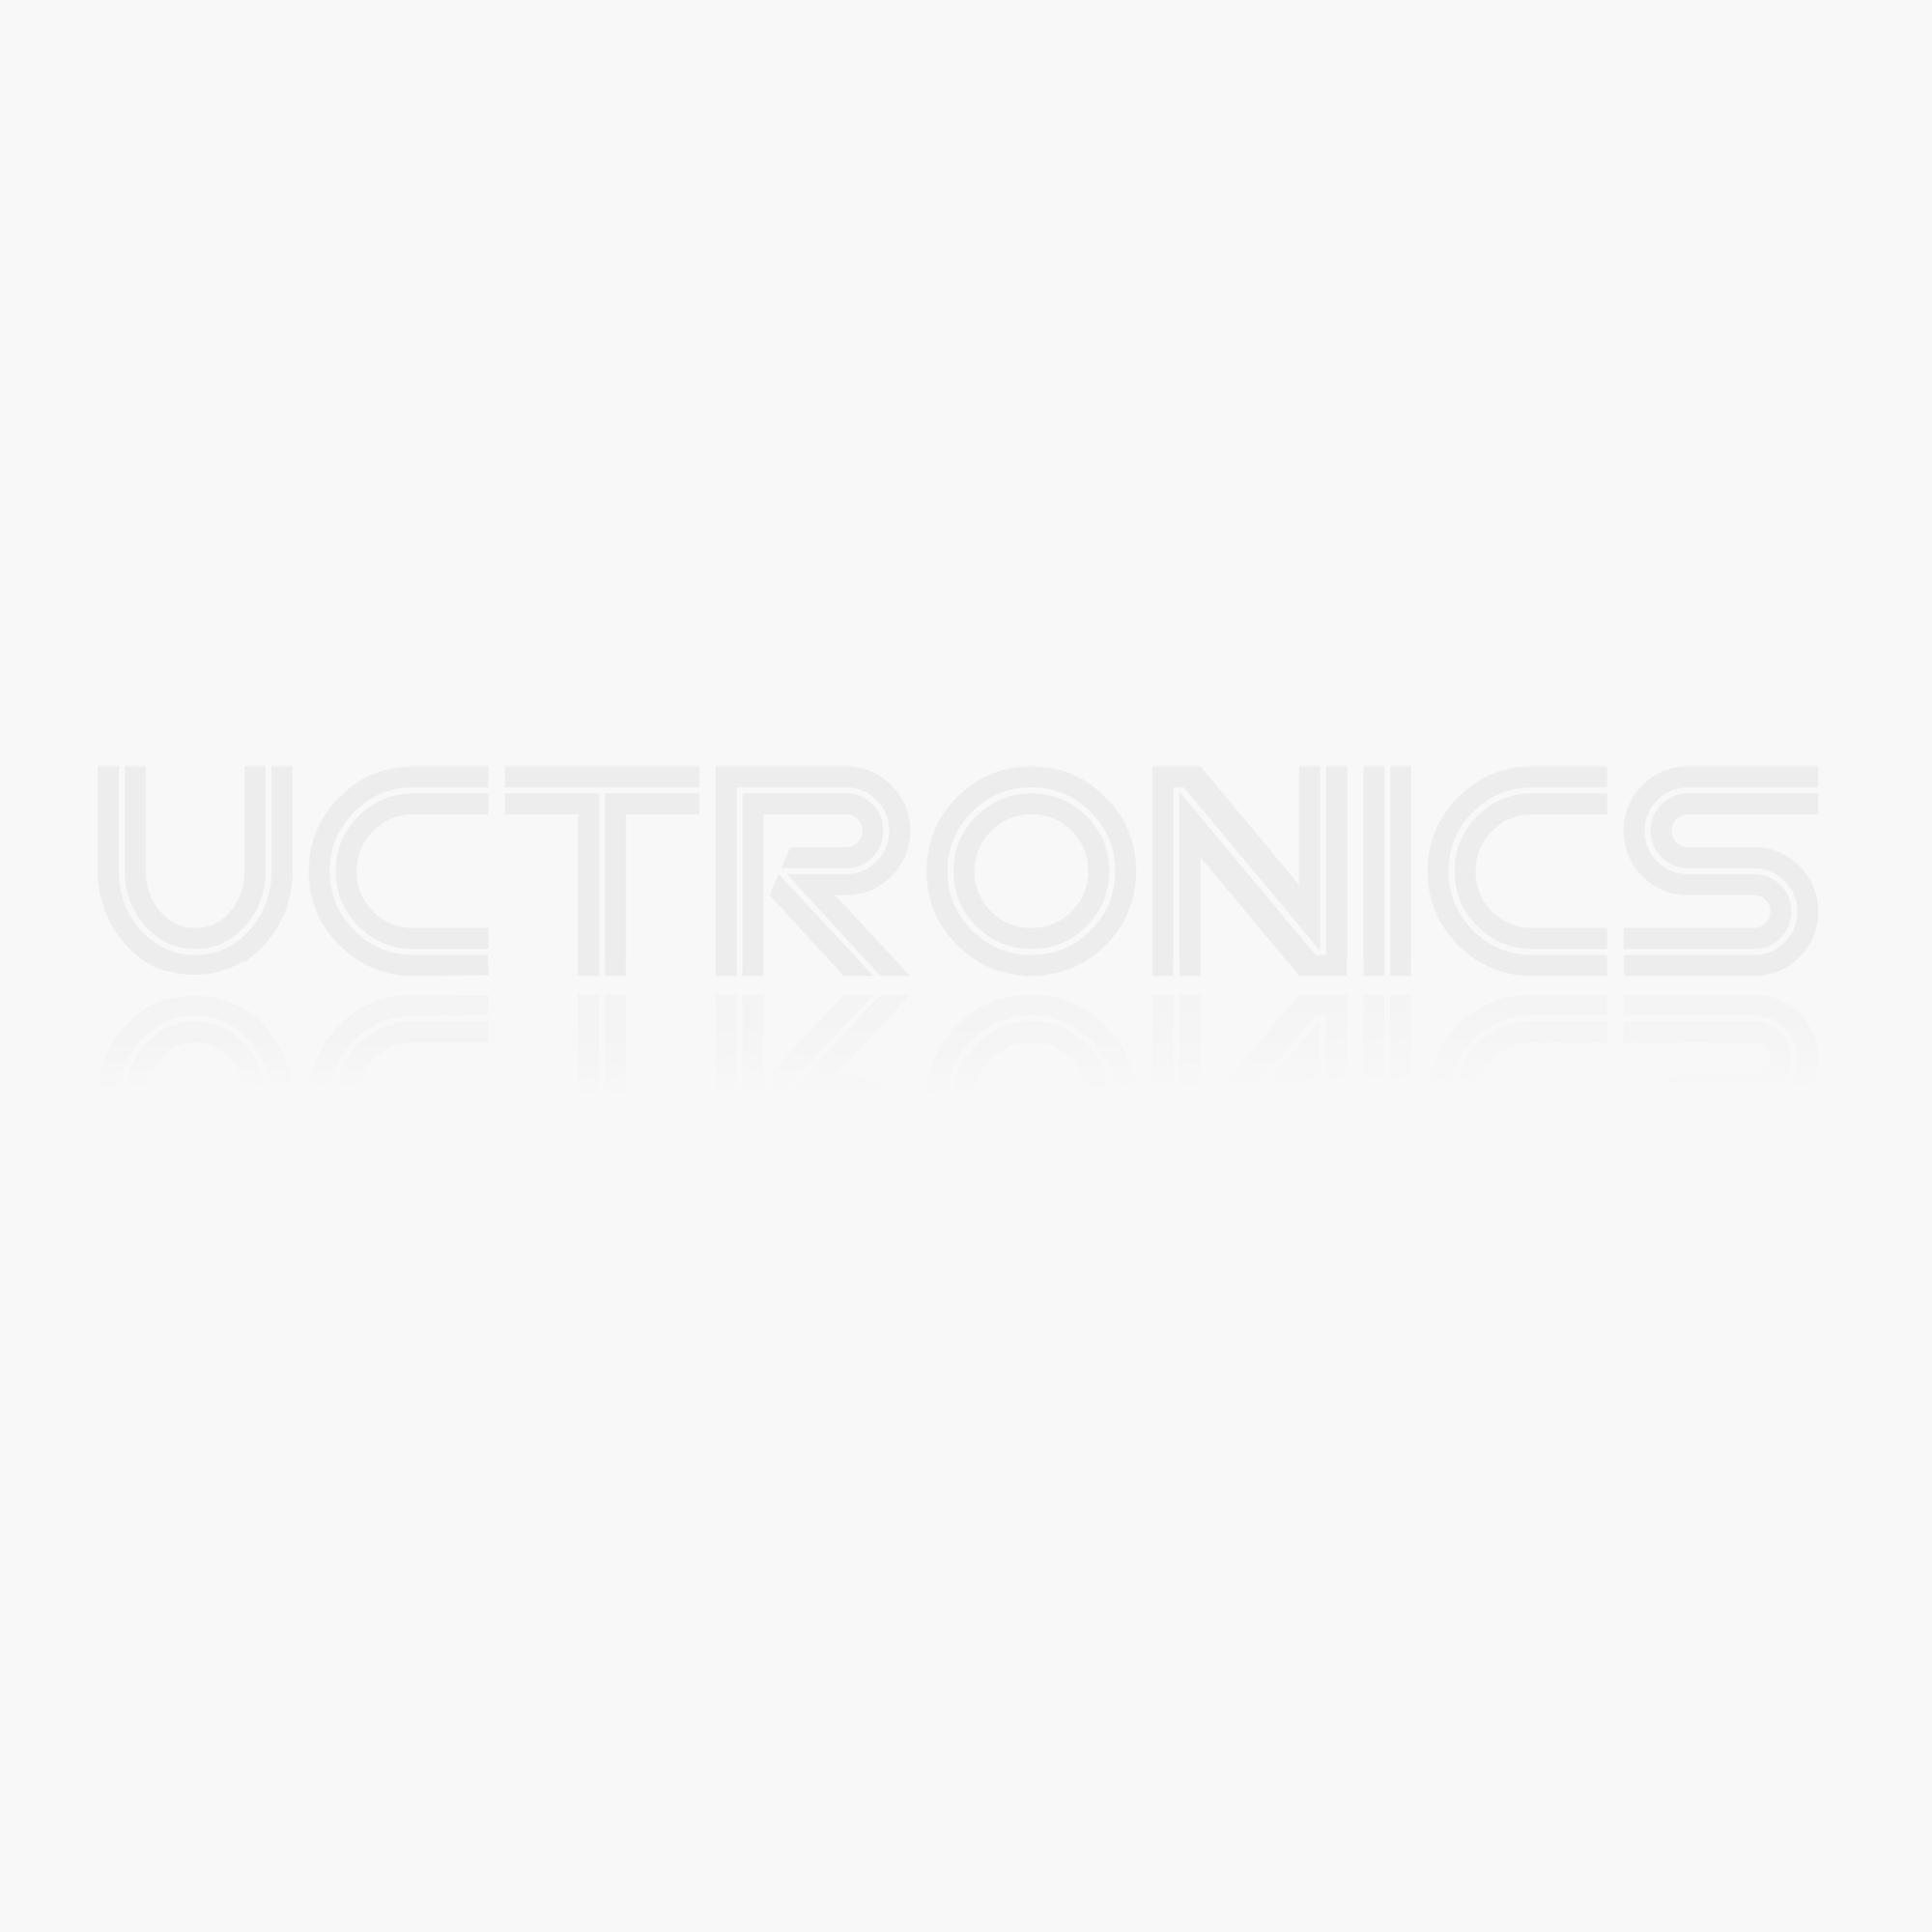 DC-DC 2V-5V Regulator 2A Solar Panel Boost step up power supply Board